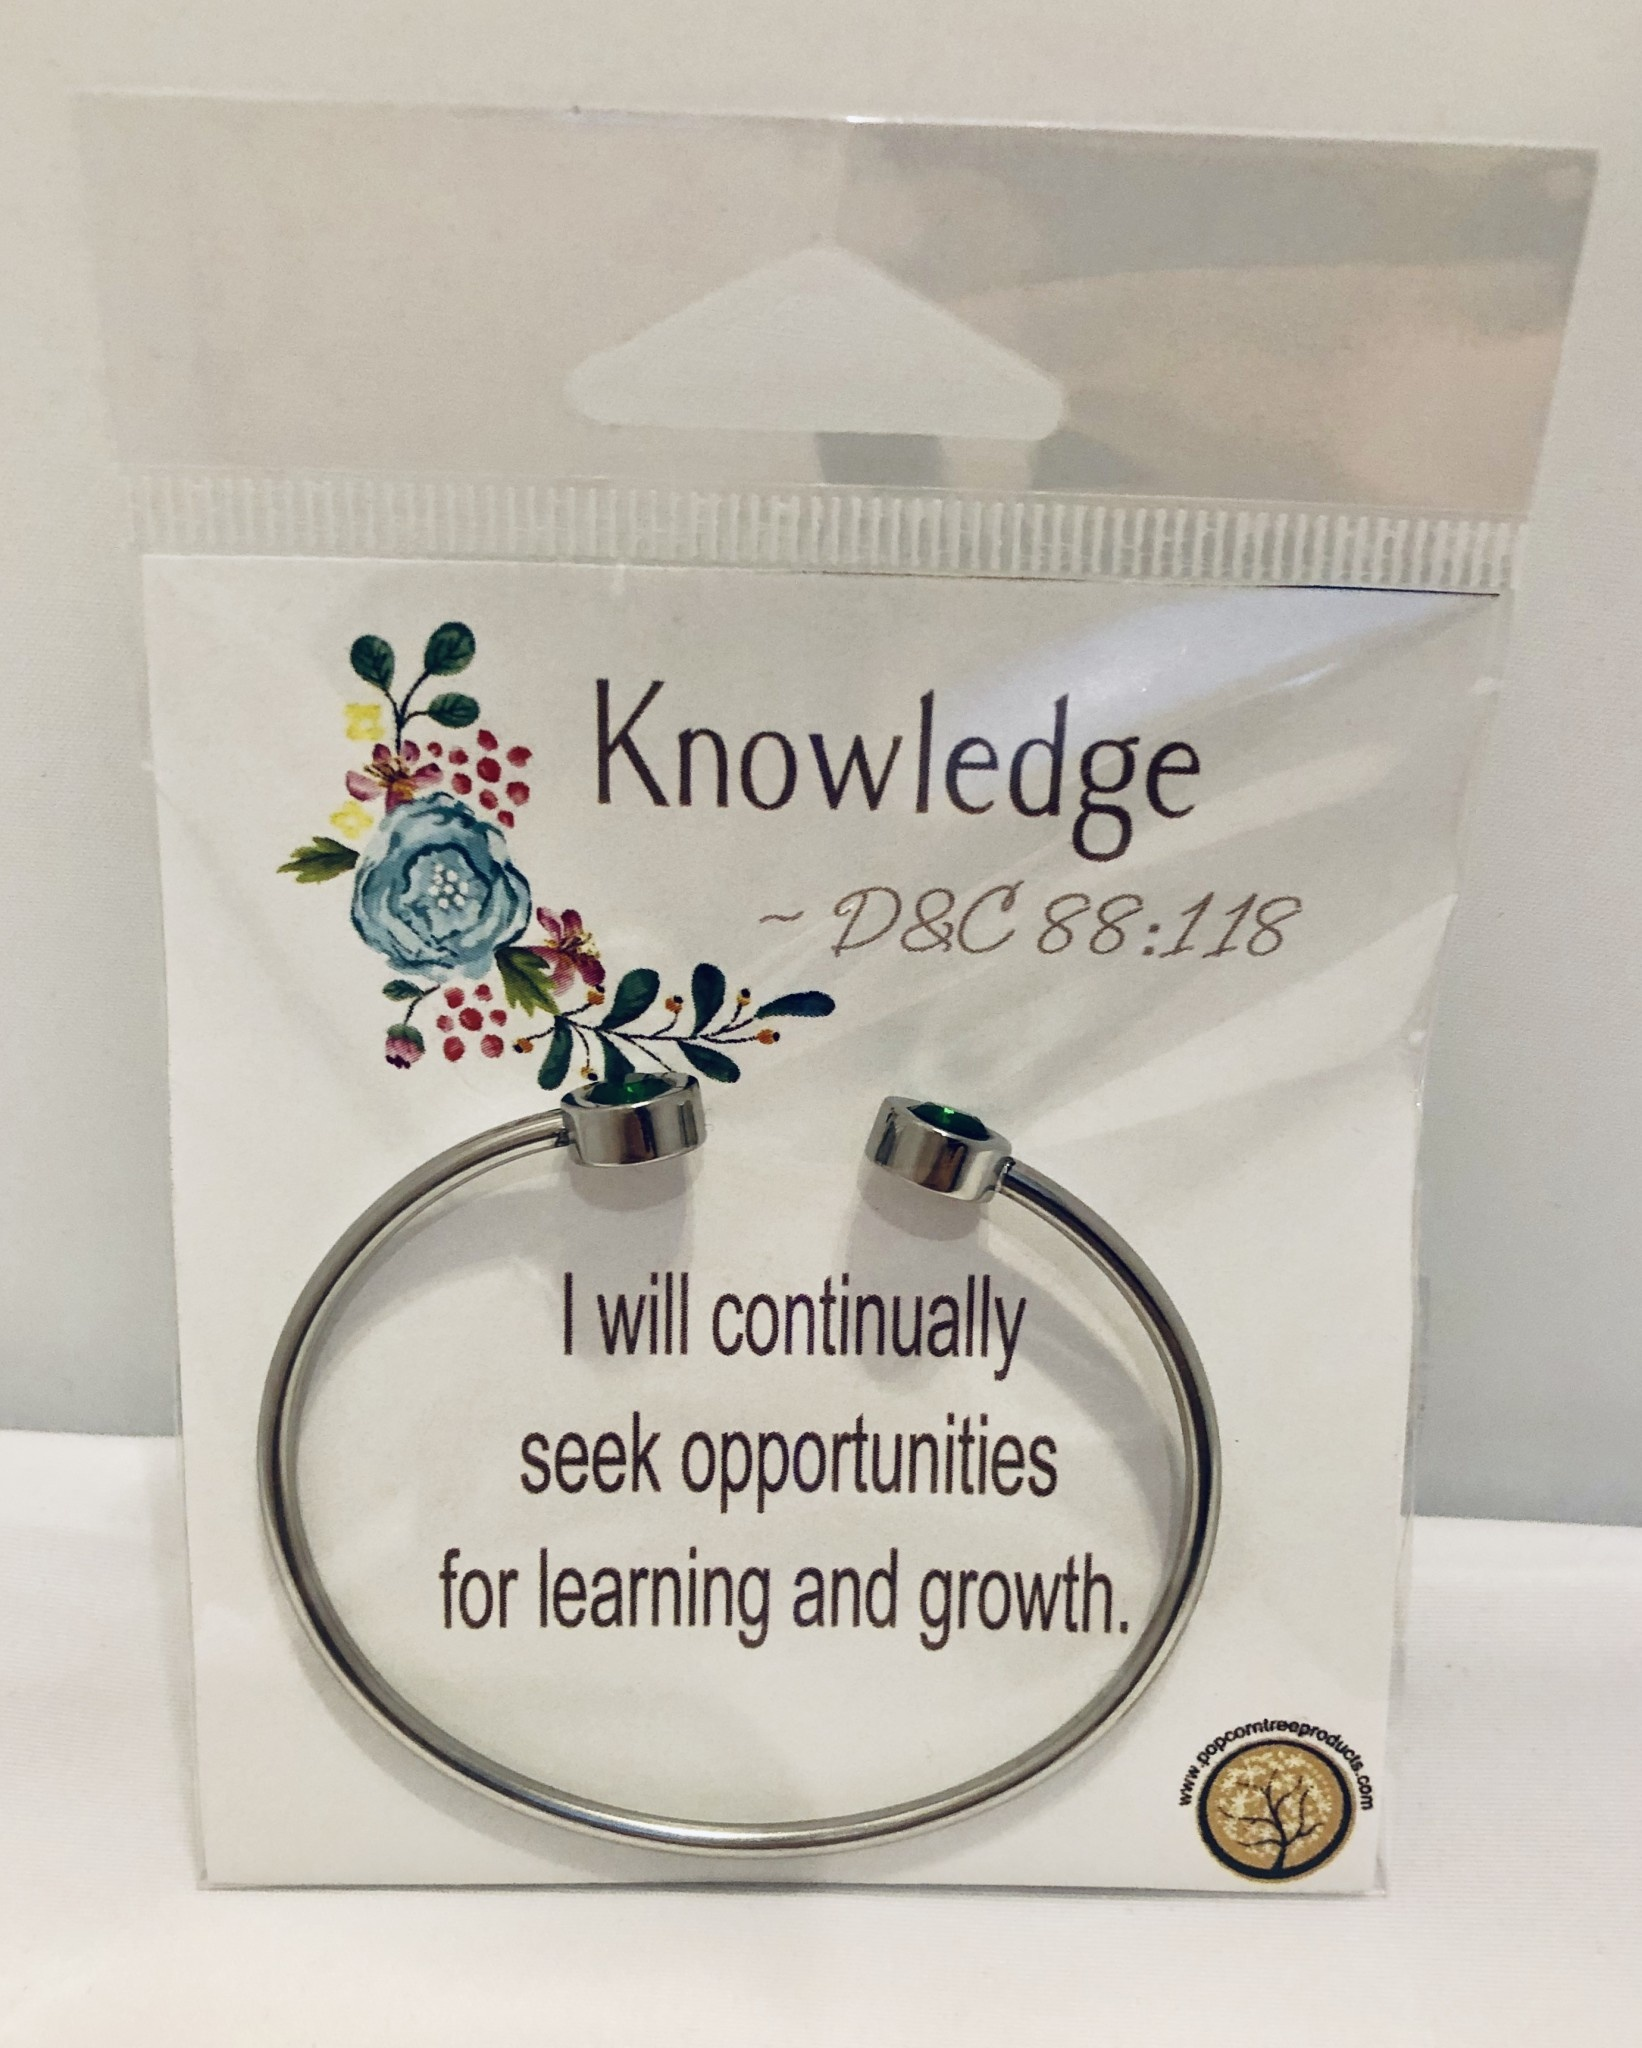 YW Value Cubic Zicornia Open Cuff Bracelet - Knowledge